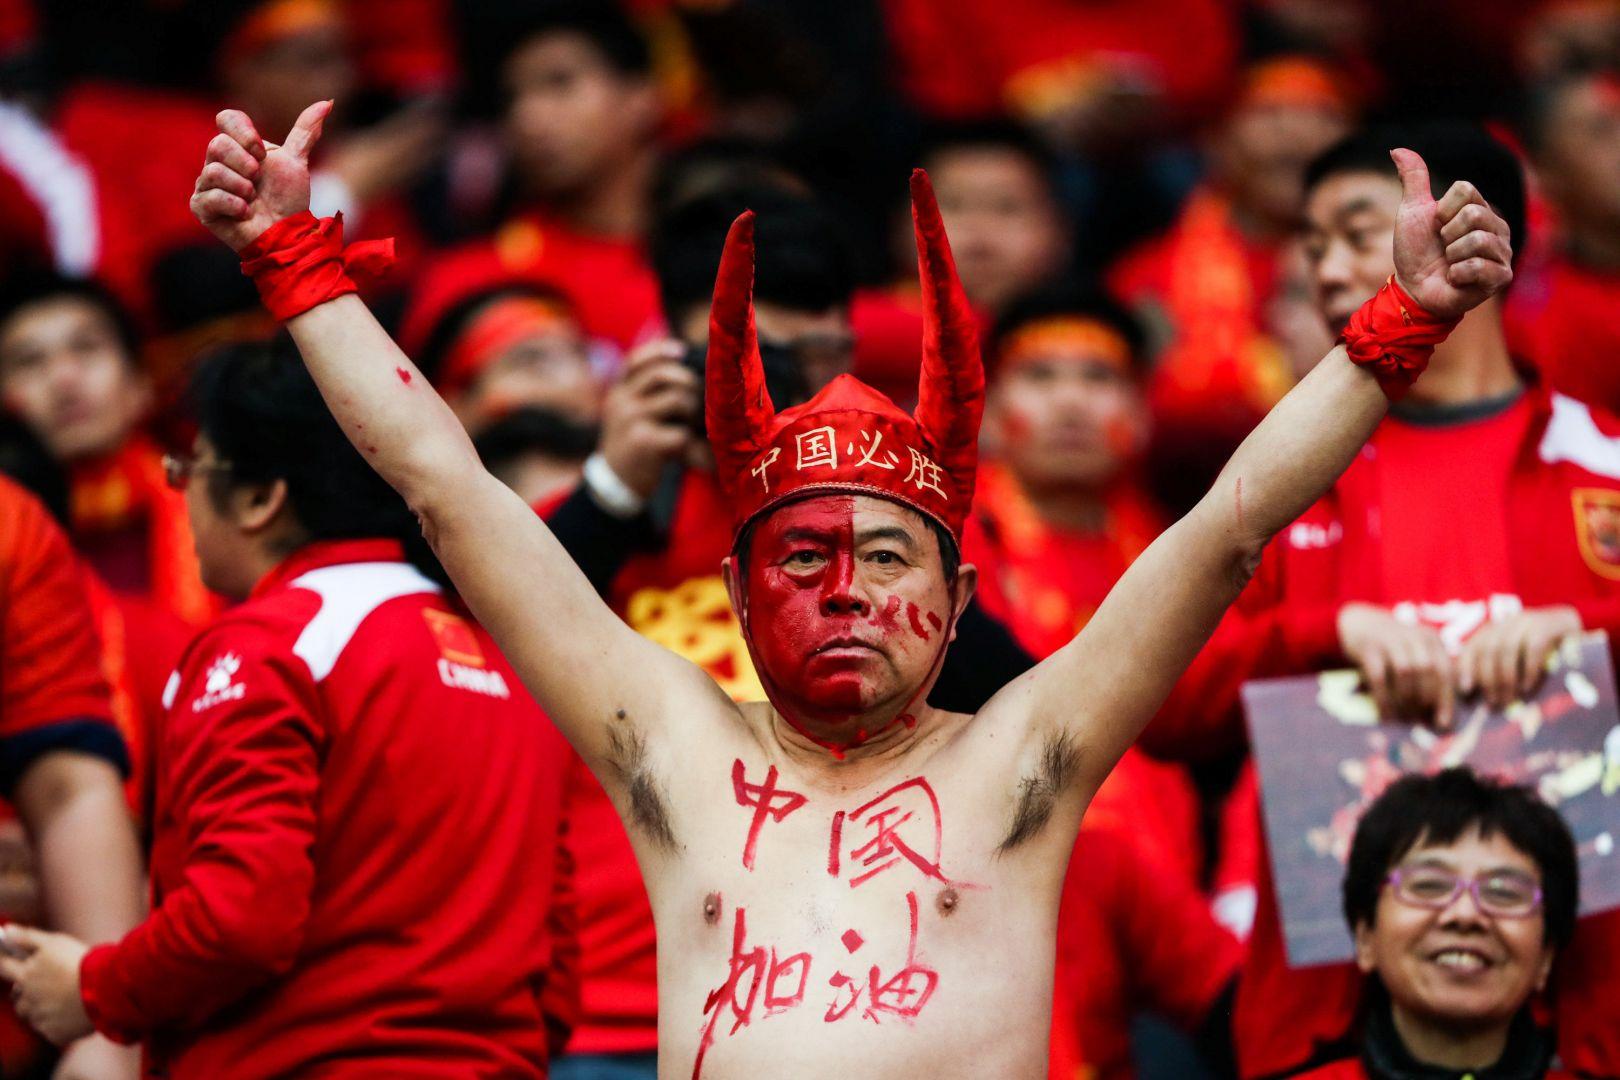 فوتبال چین - چین - تیم ملی چین